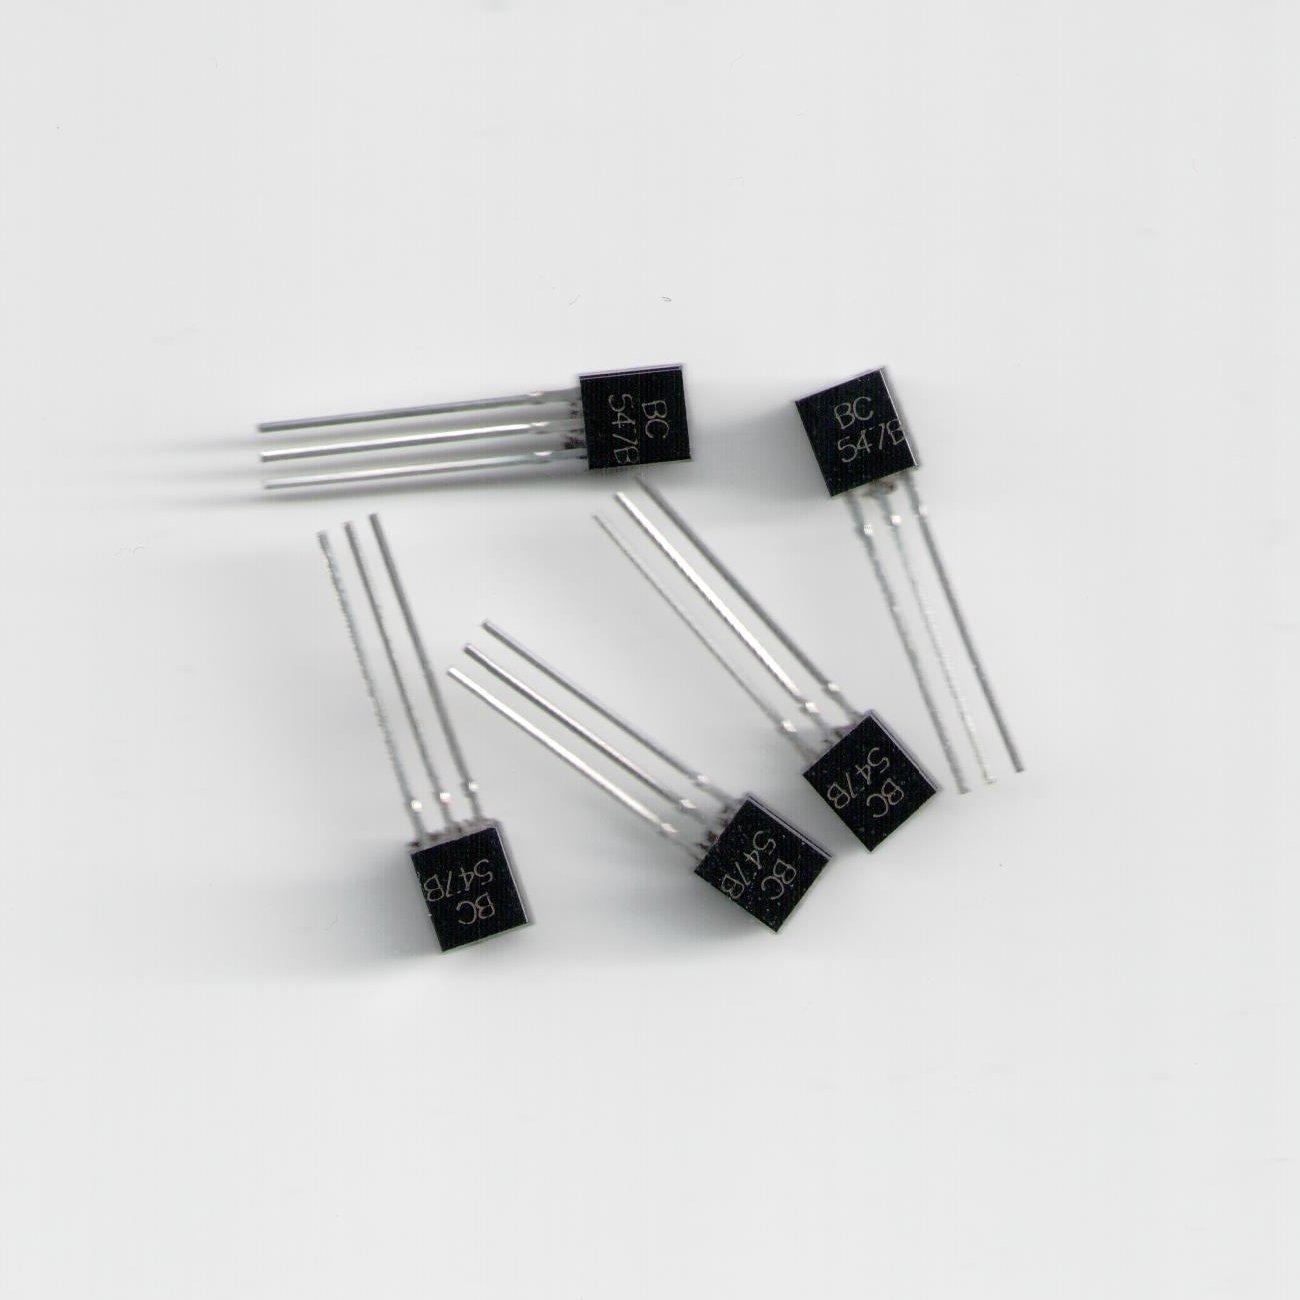 Component7 Bc 547 Npn Amplifier Transistors 5 Pc Electronics Transistor Circuit